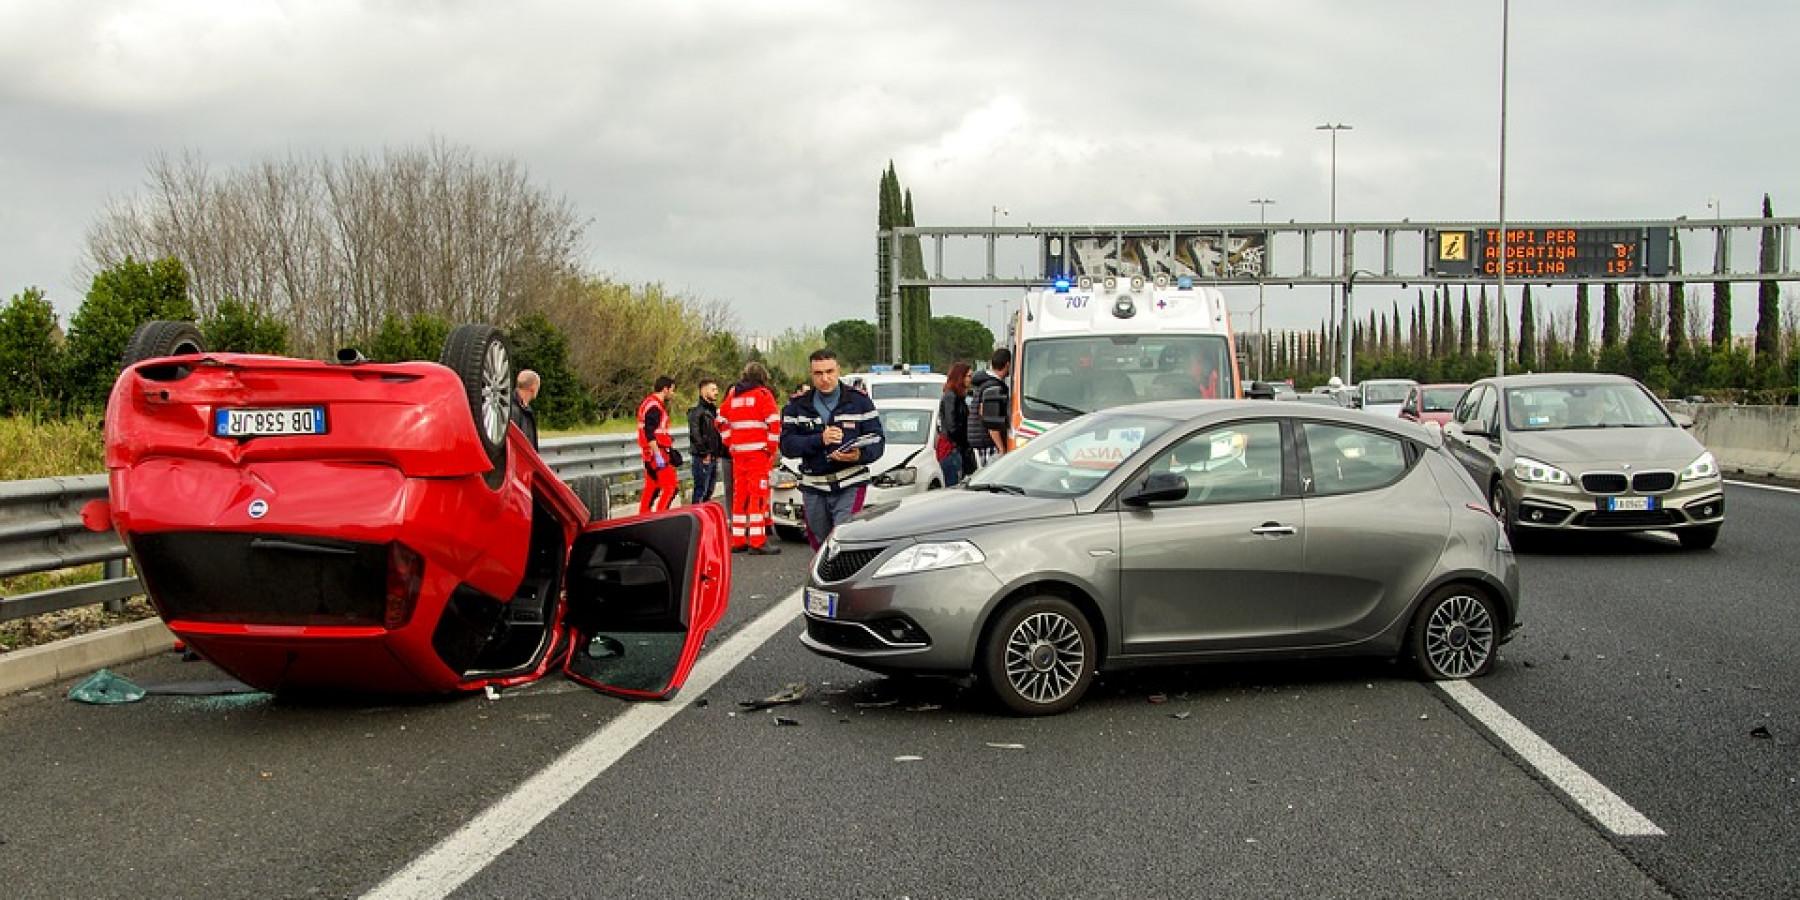 Unfall im Kreuz Lotte/Osnabrück – 40-jähriger Autofahrer schwer verletzt